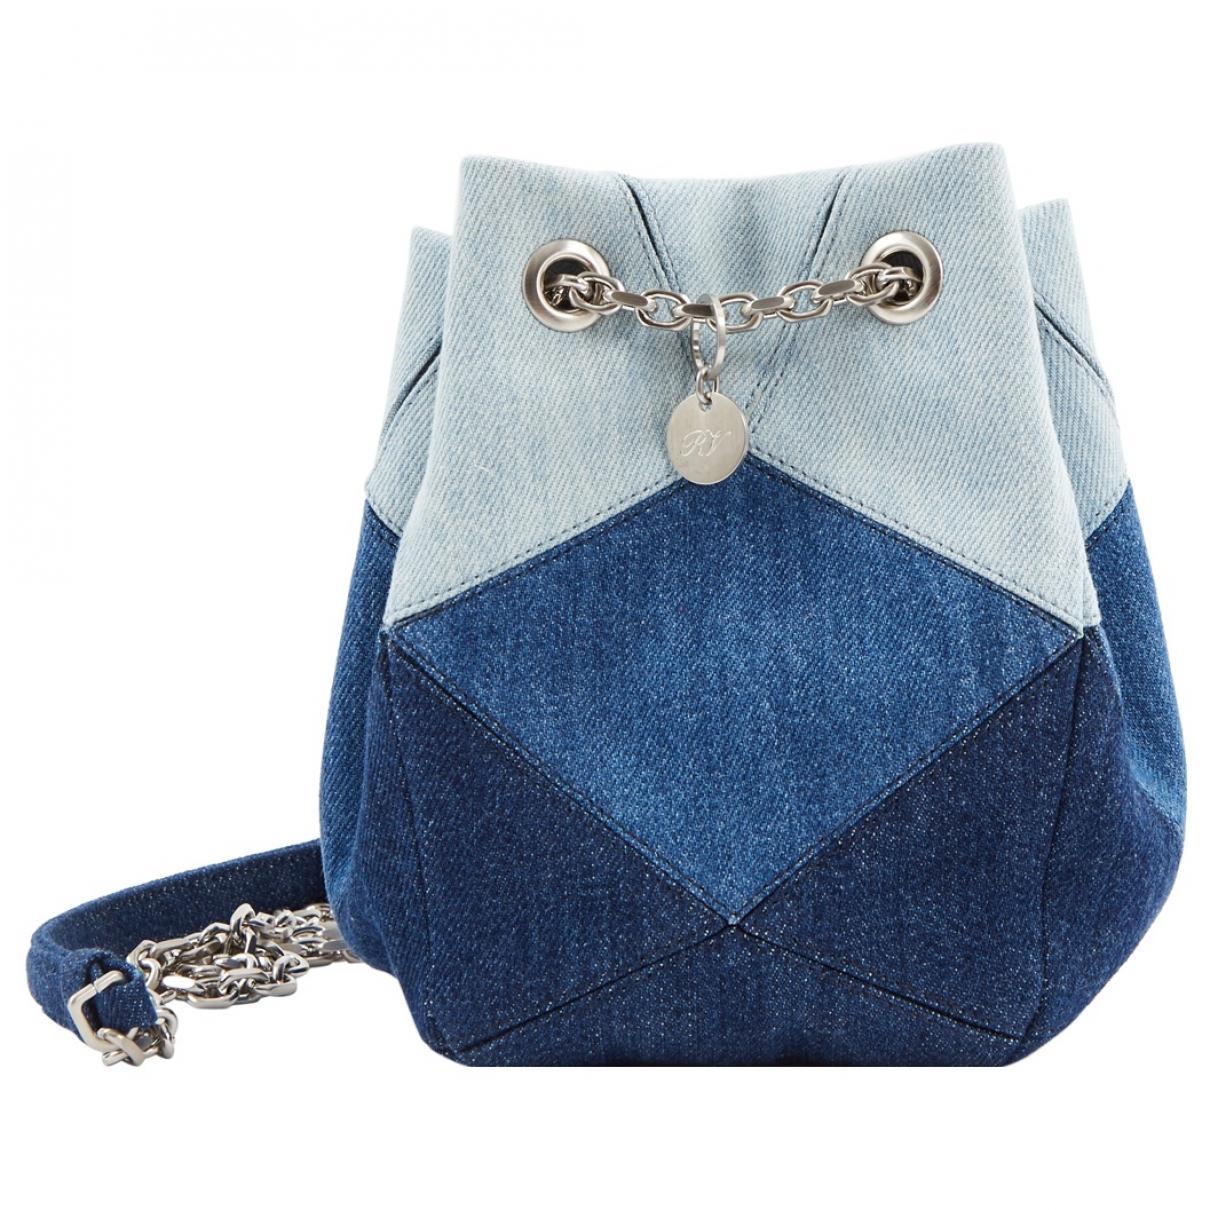 Lyst - Roger Vivier Pre-owned Cloth Handbag in Blue bcb6b9cf9029d